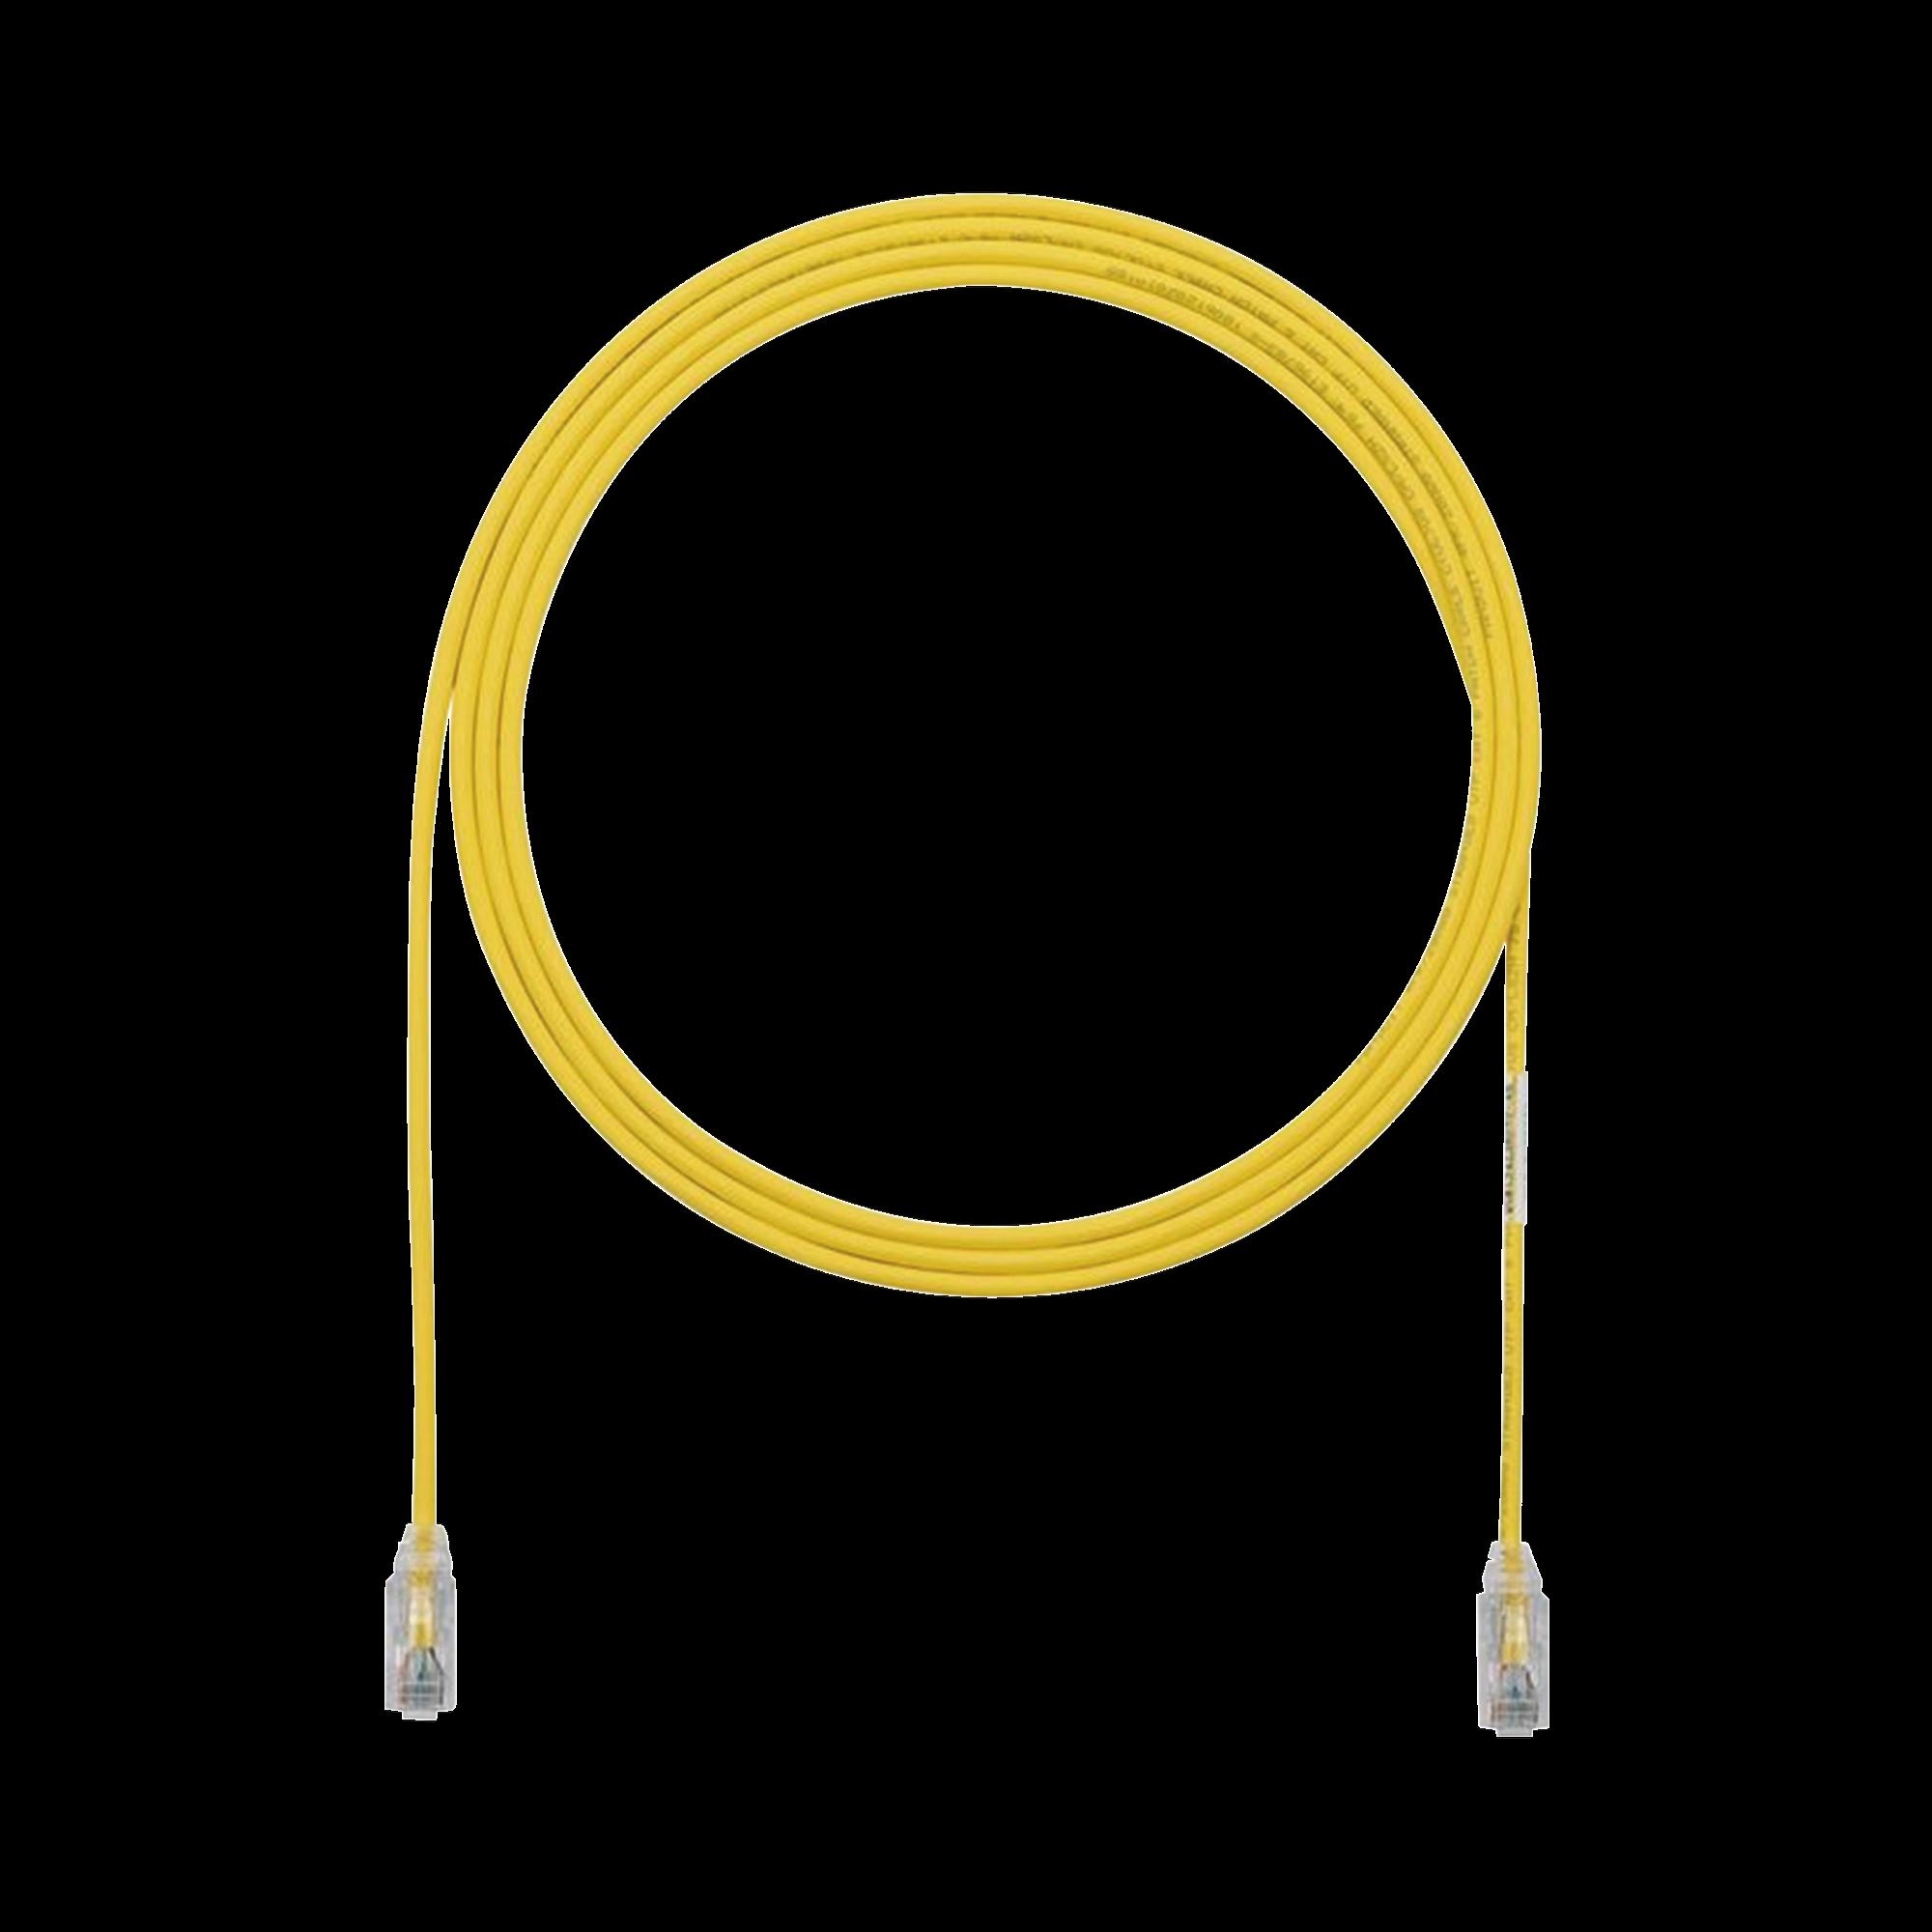 Cable de Parcheo TX6, UTP Cat6, Diámetro Reducido (28AWG), Color Amarillo, 7ft